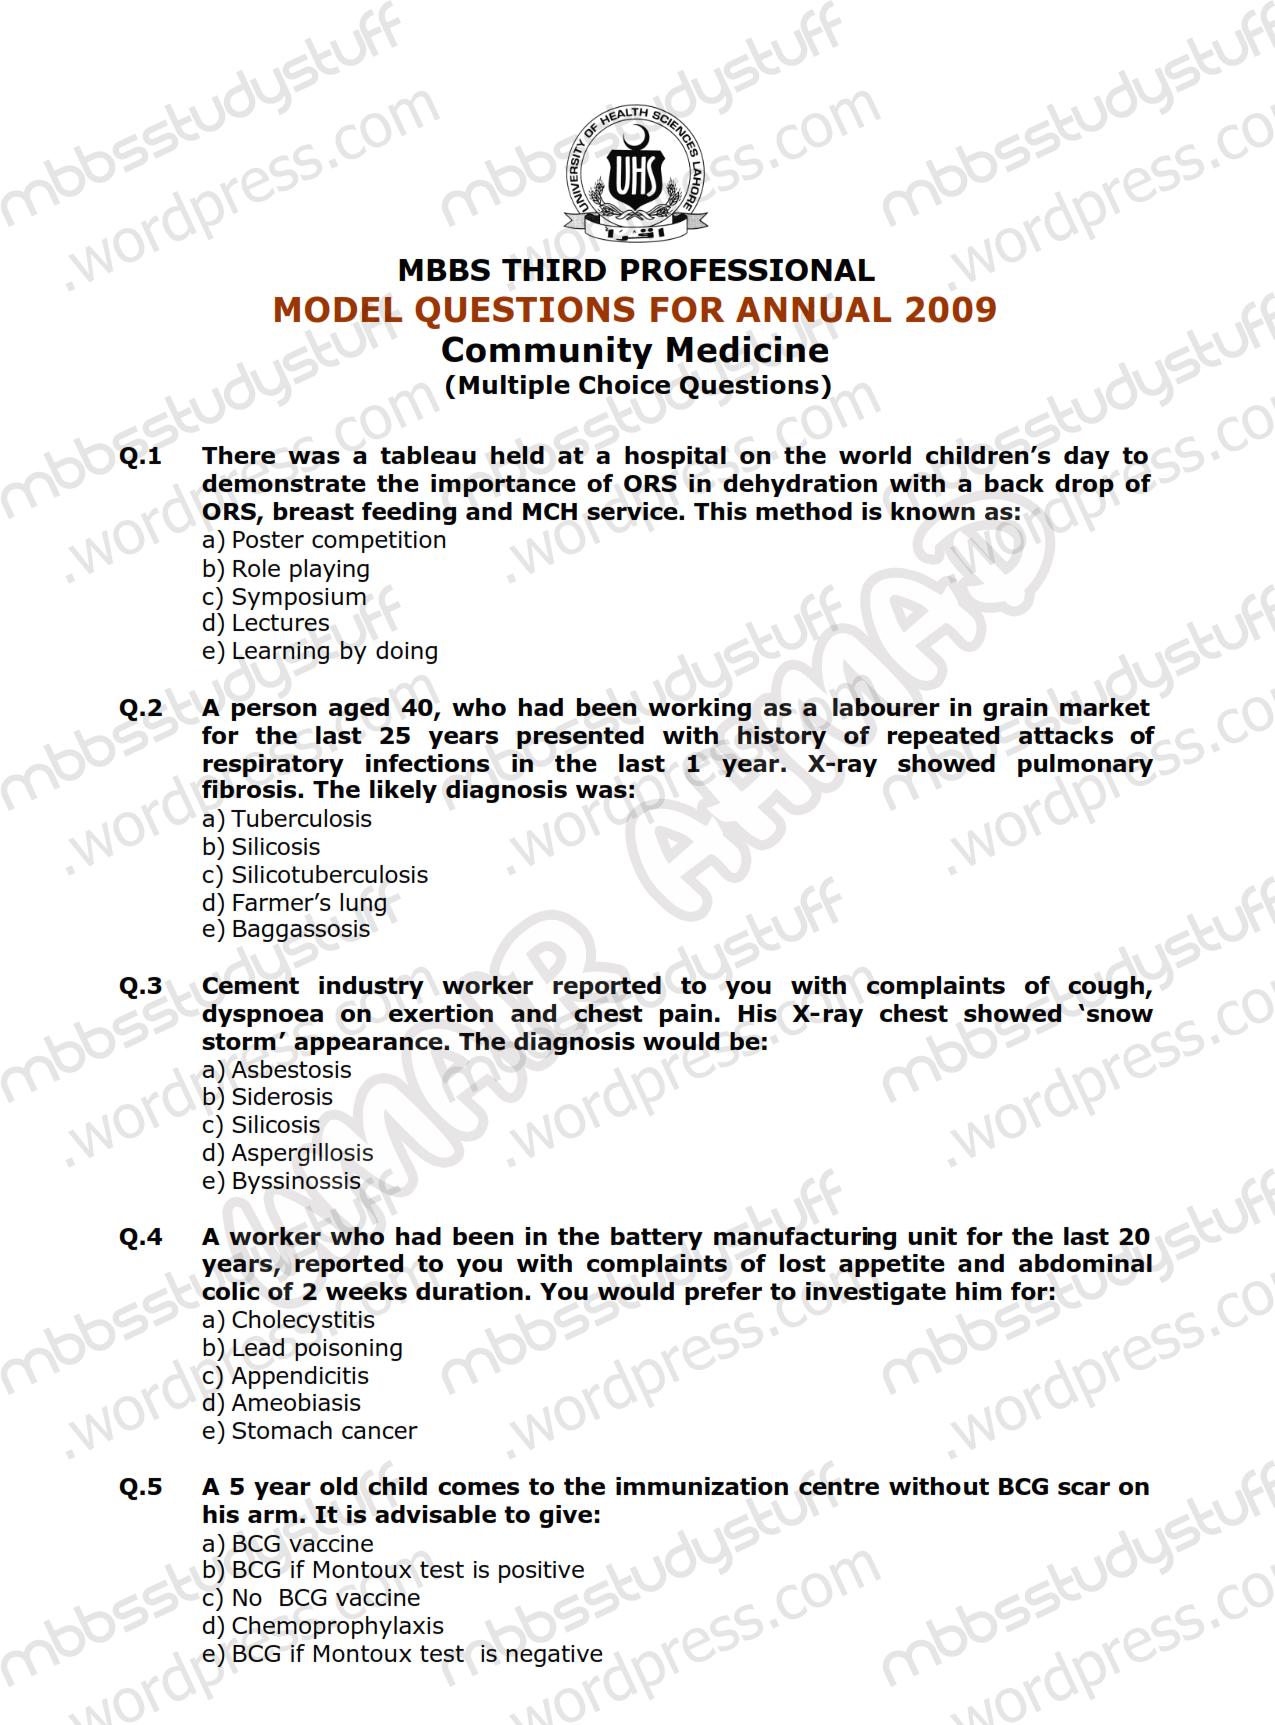 Community Medicine MCQ Model Paper 2009 | MBBS Study Stuff